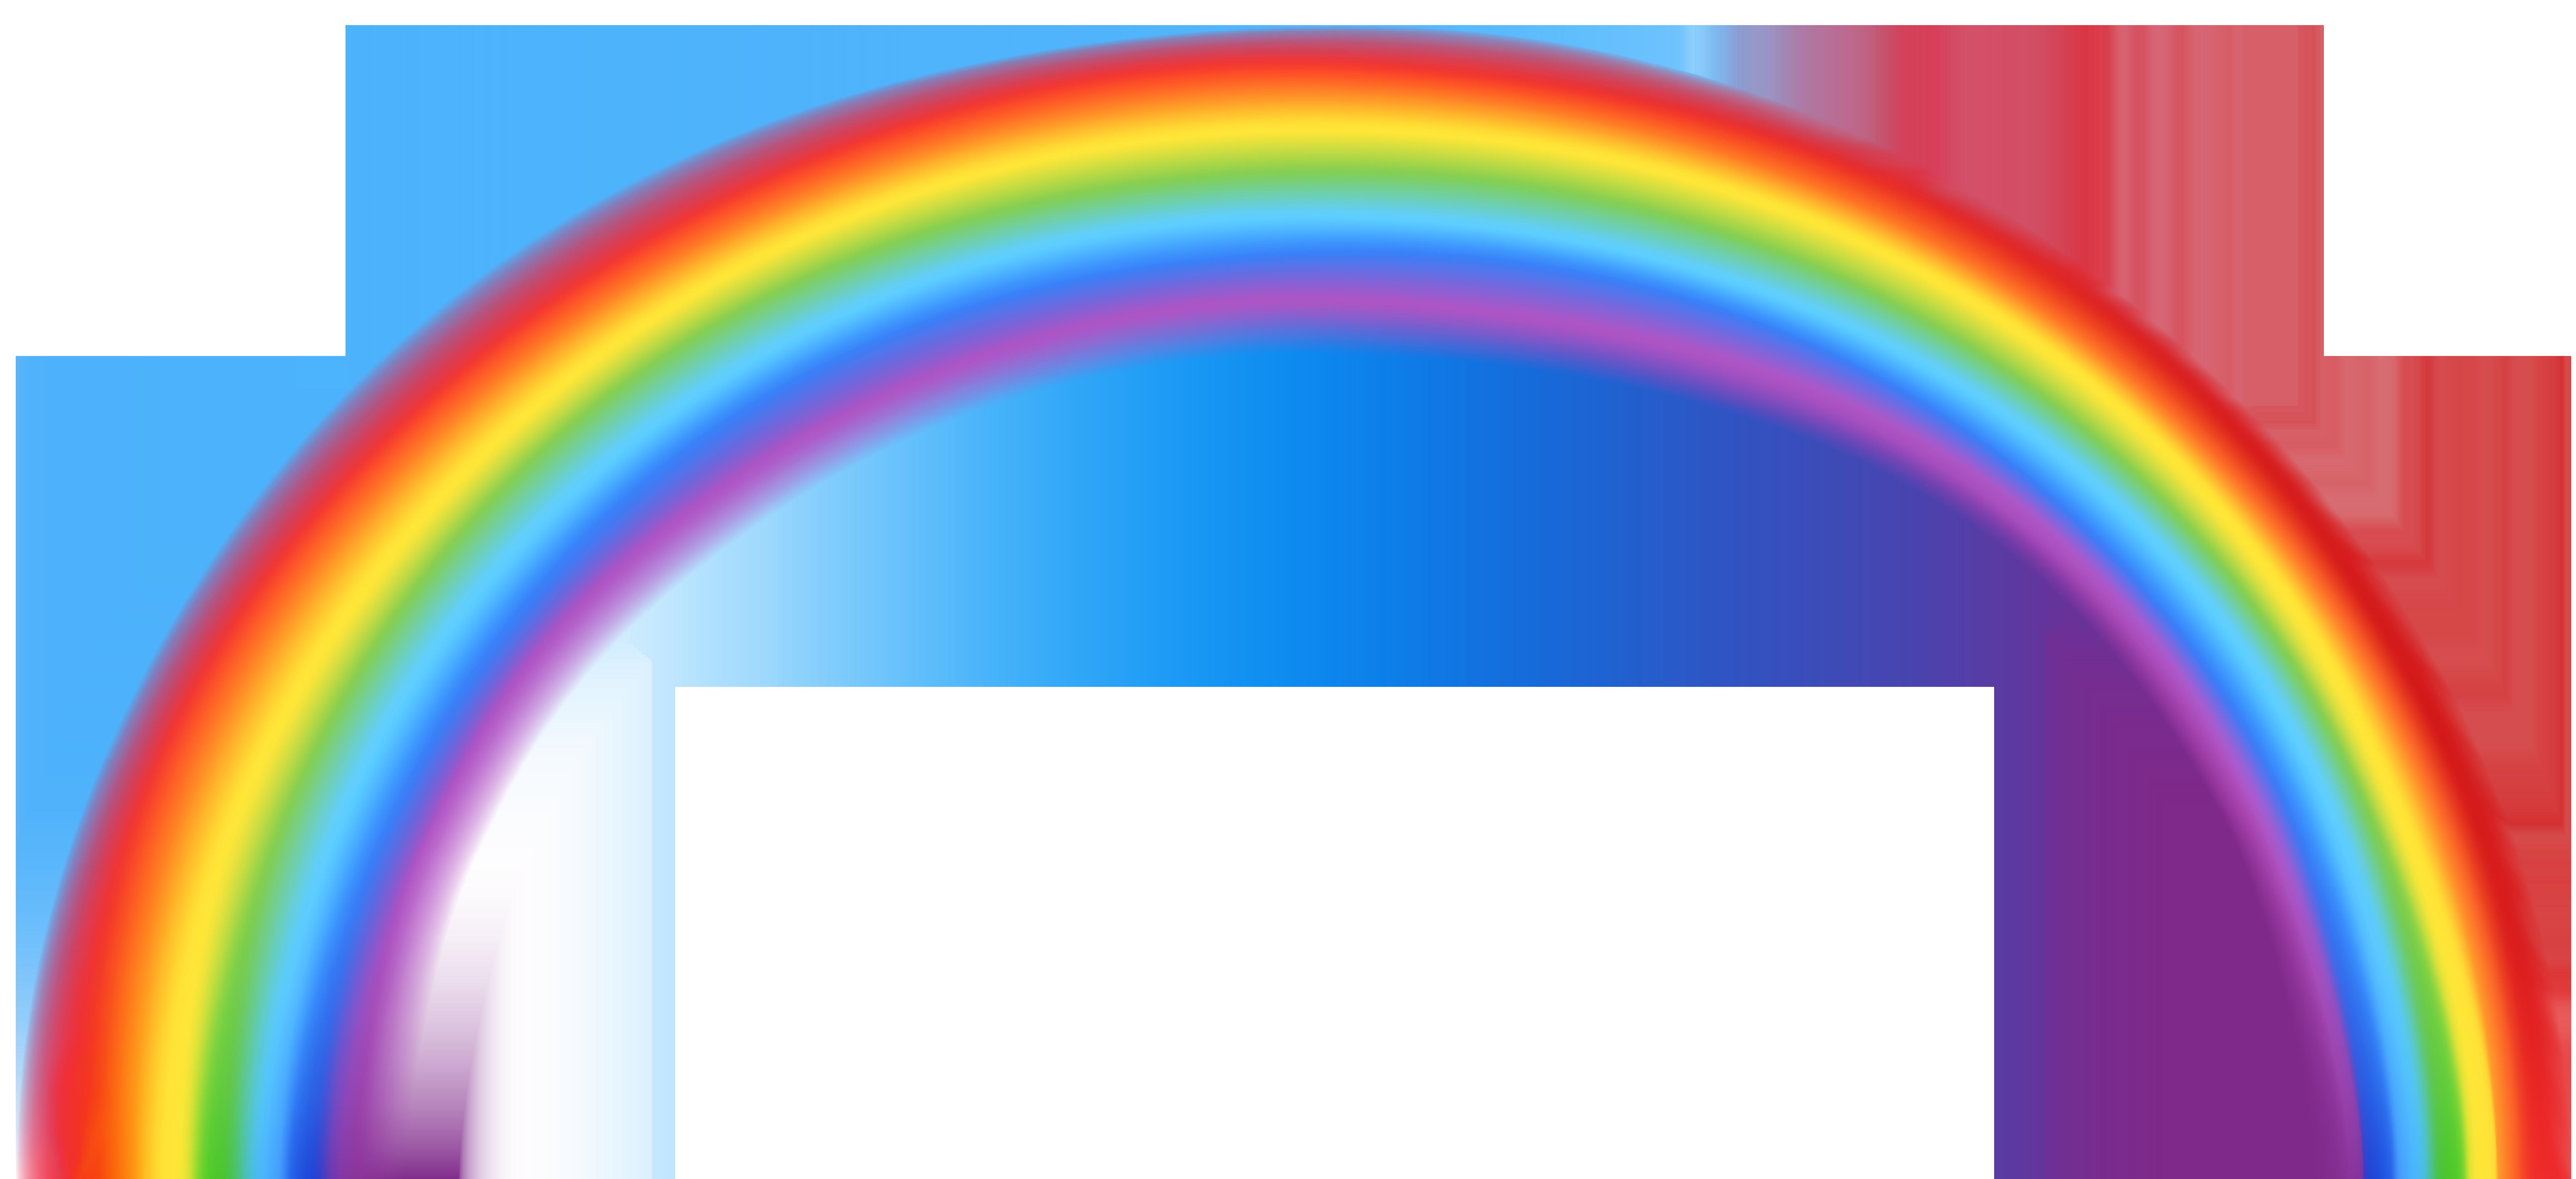 pin by the king on bvbv pinterest rainbow png art images and rh pinterest co uk Rainbow Bridge Clip Art GIF Rainbow Bridge Black and White